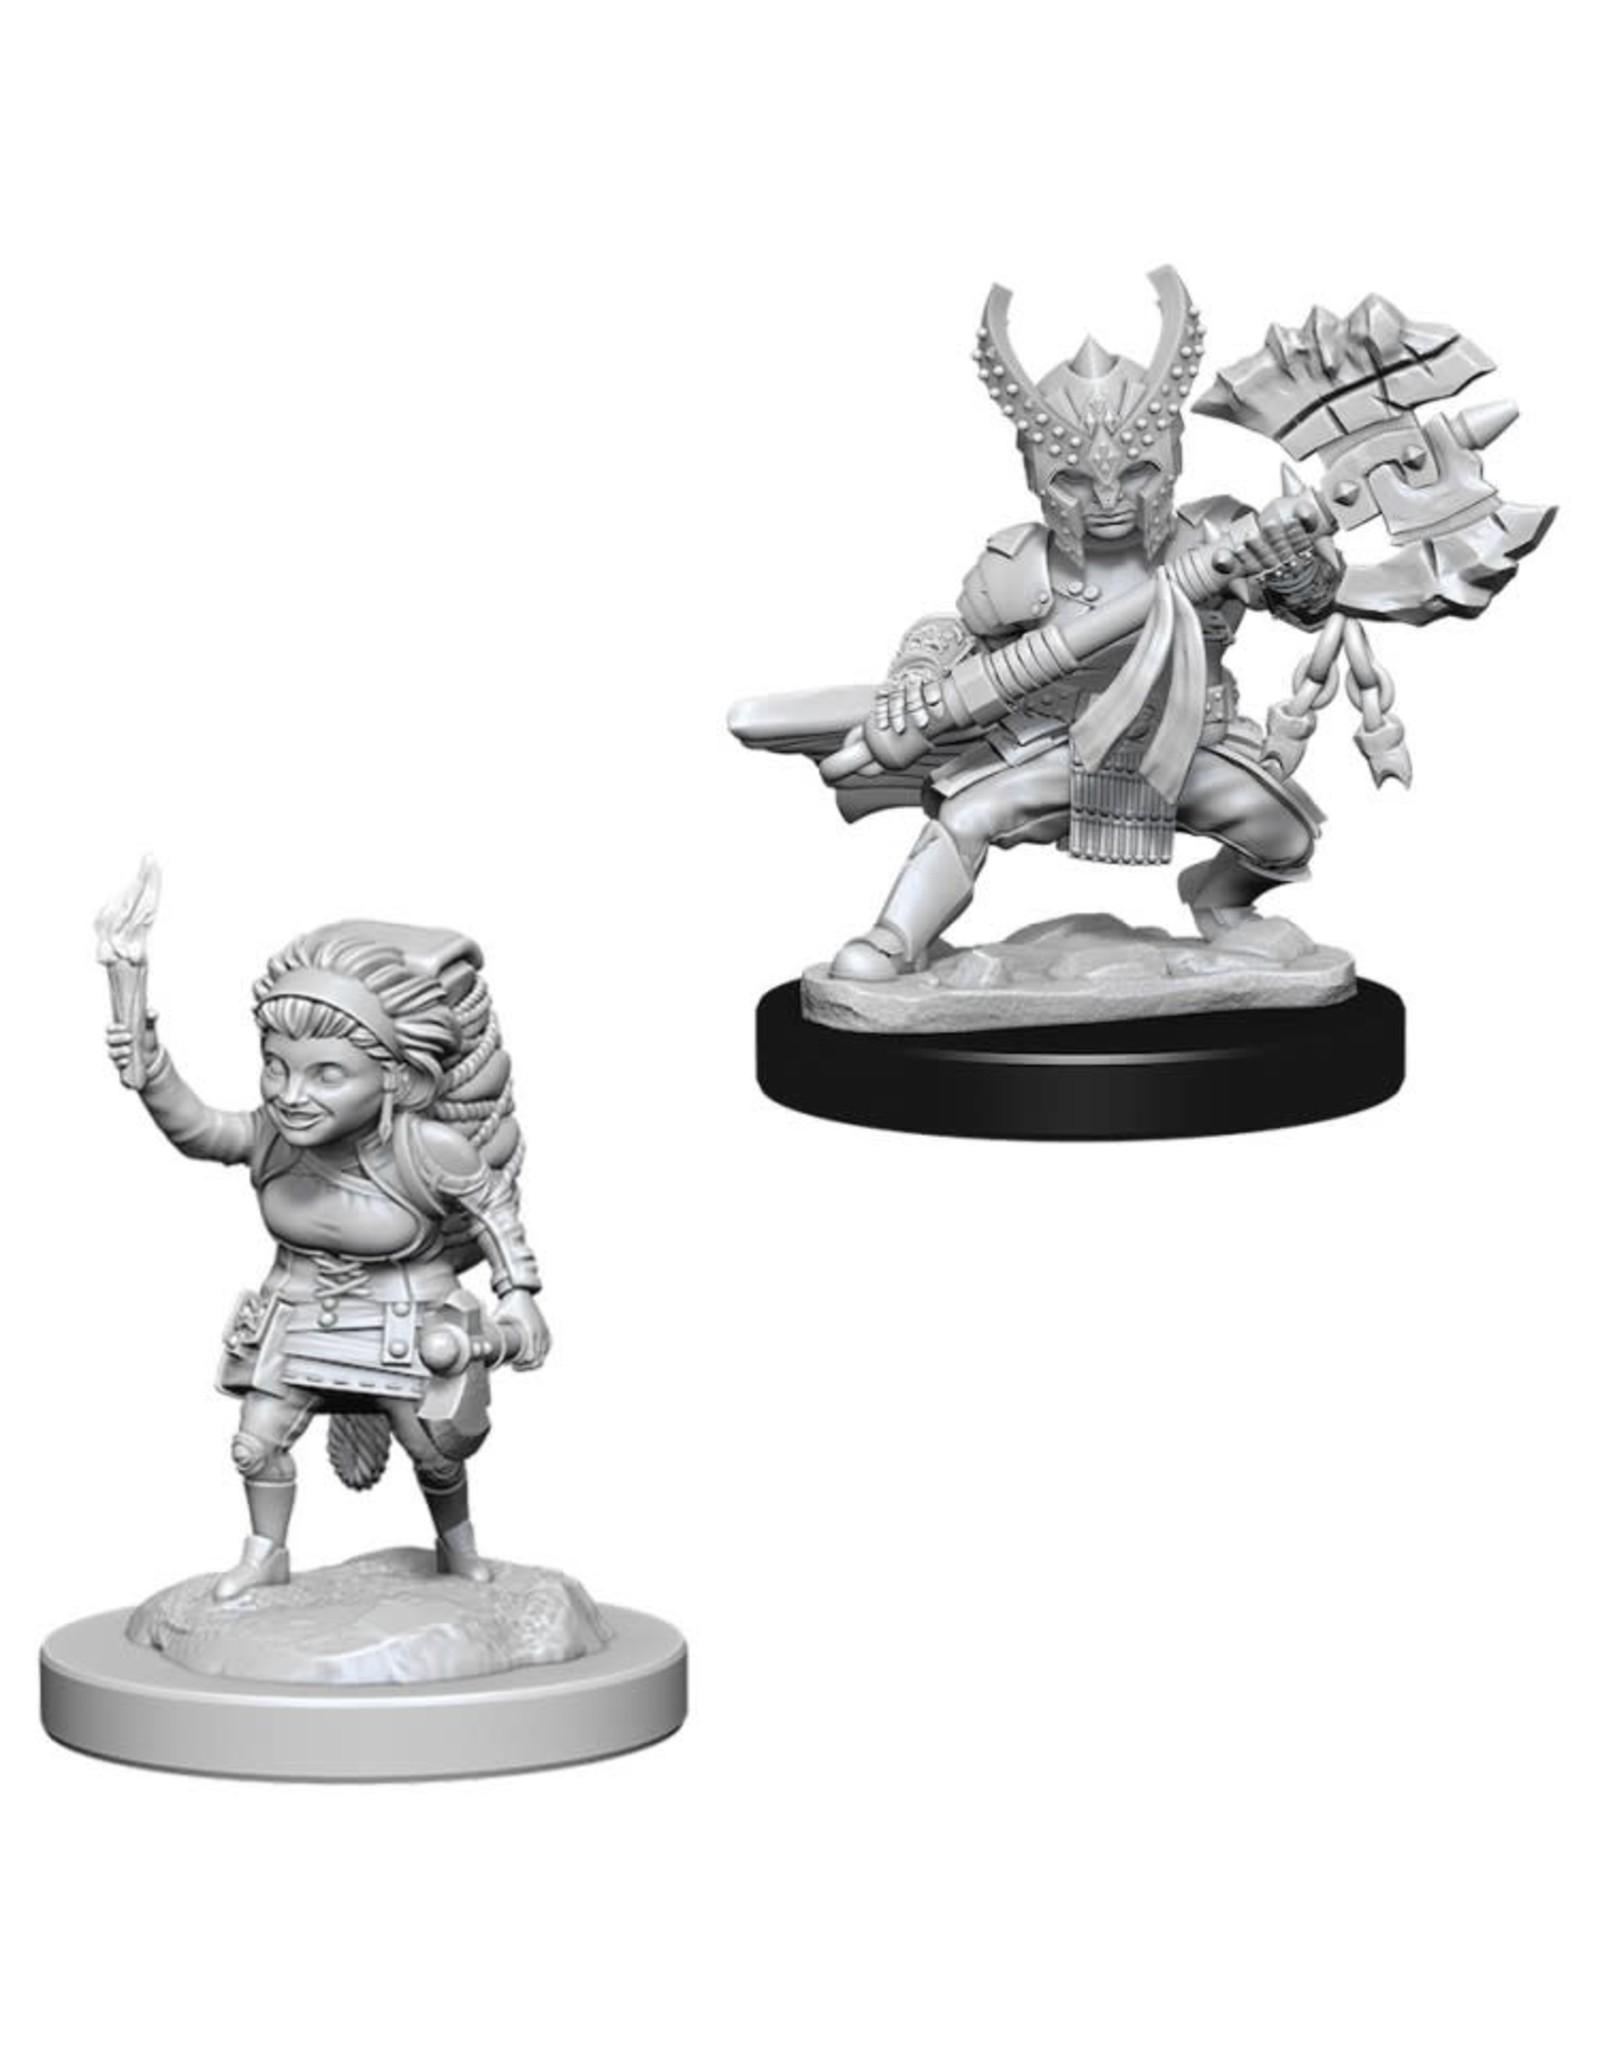 WizKids D&D Nolzur's Marvelous Miniatures (unpainted): Halfling Fighter (female)